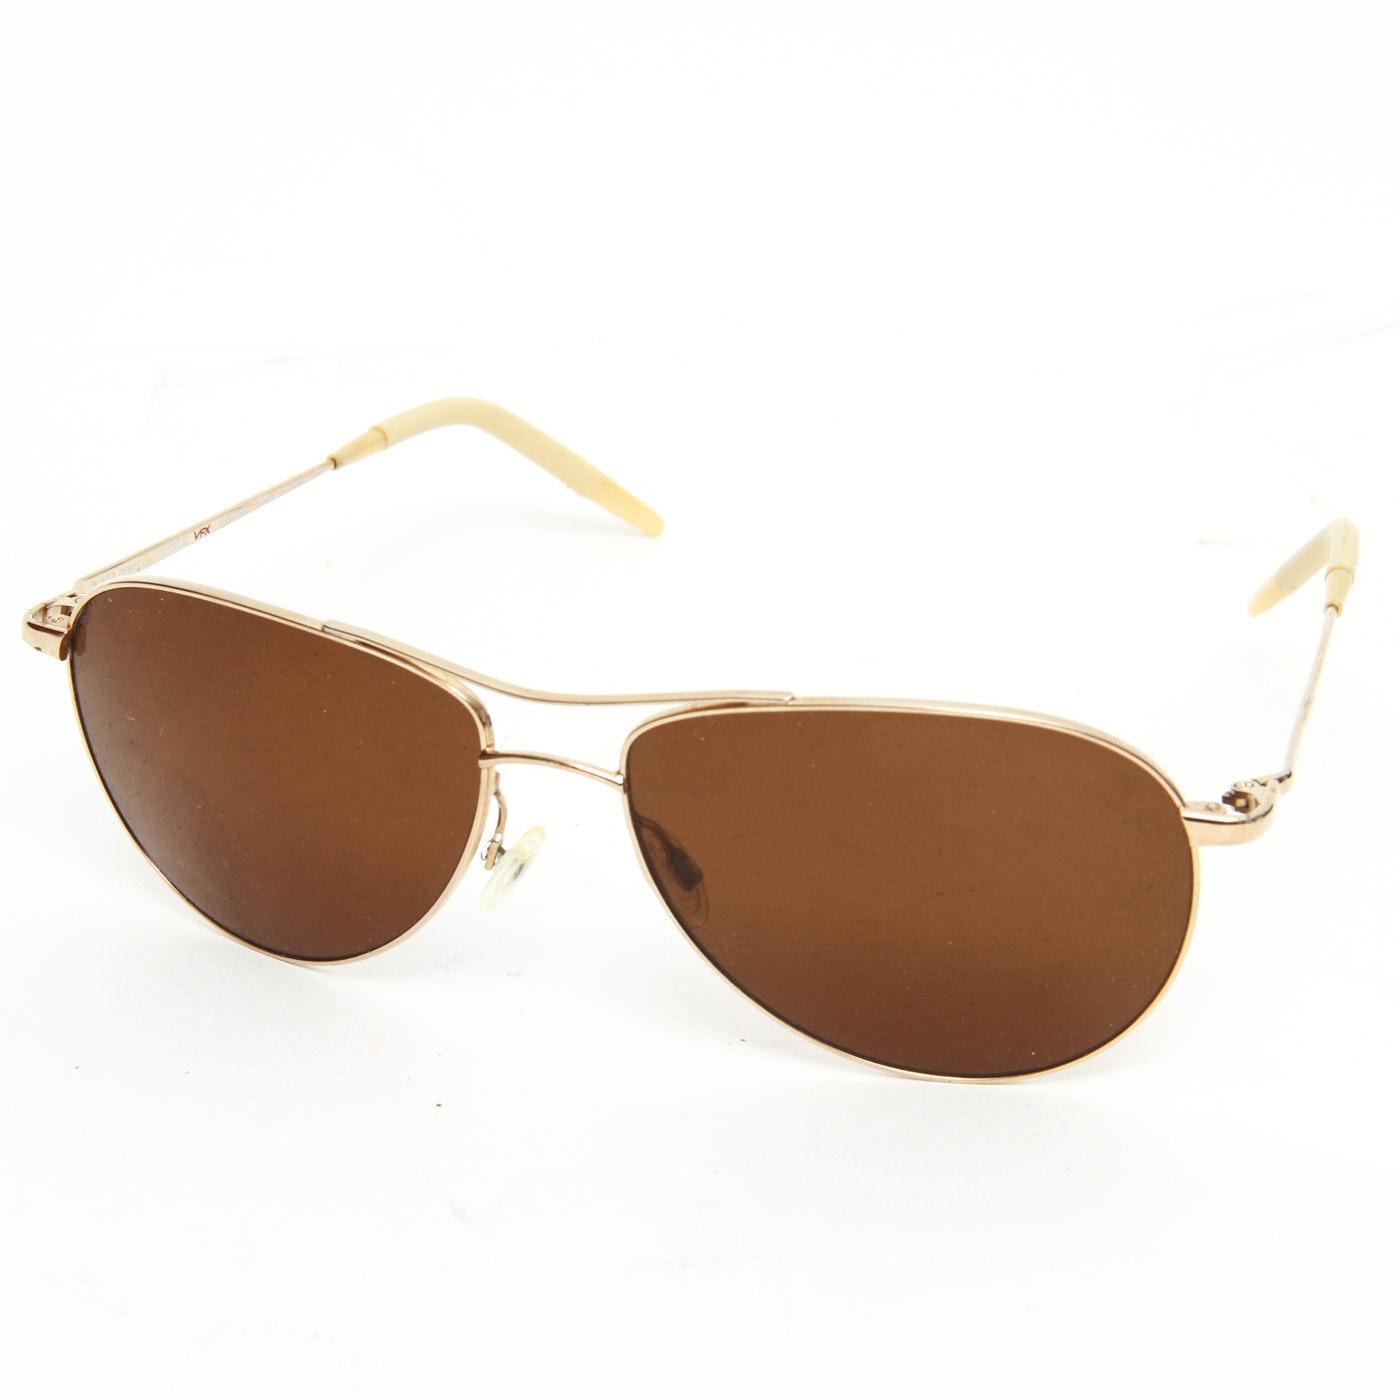 "Oliver Peoples ""Benedict"" Sunglasses"